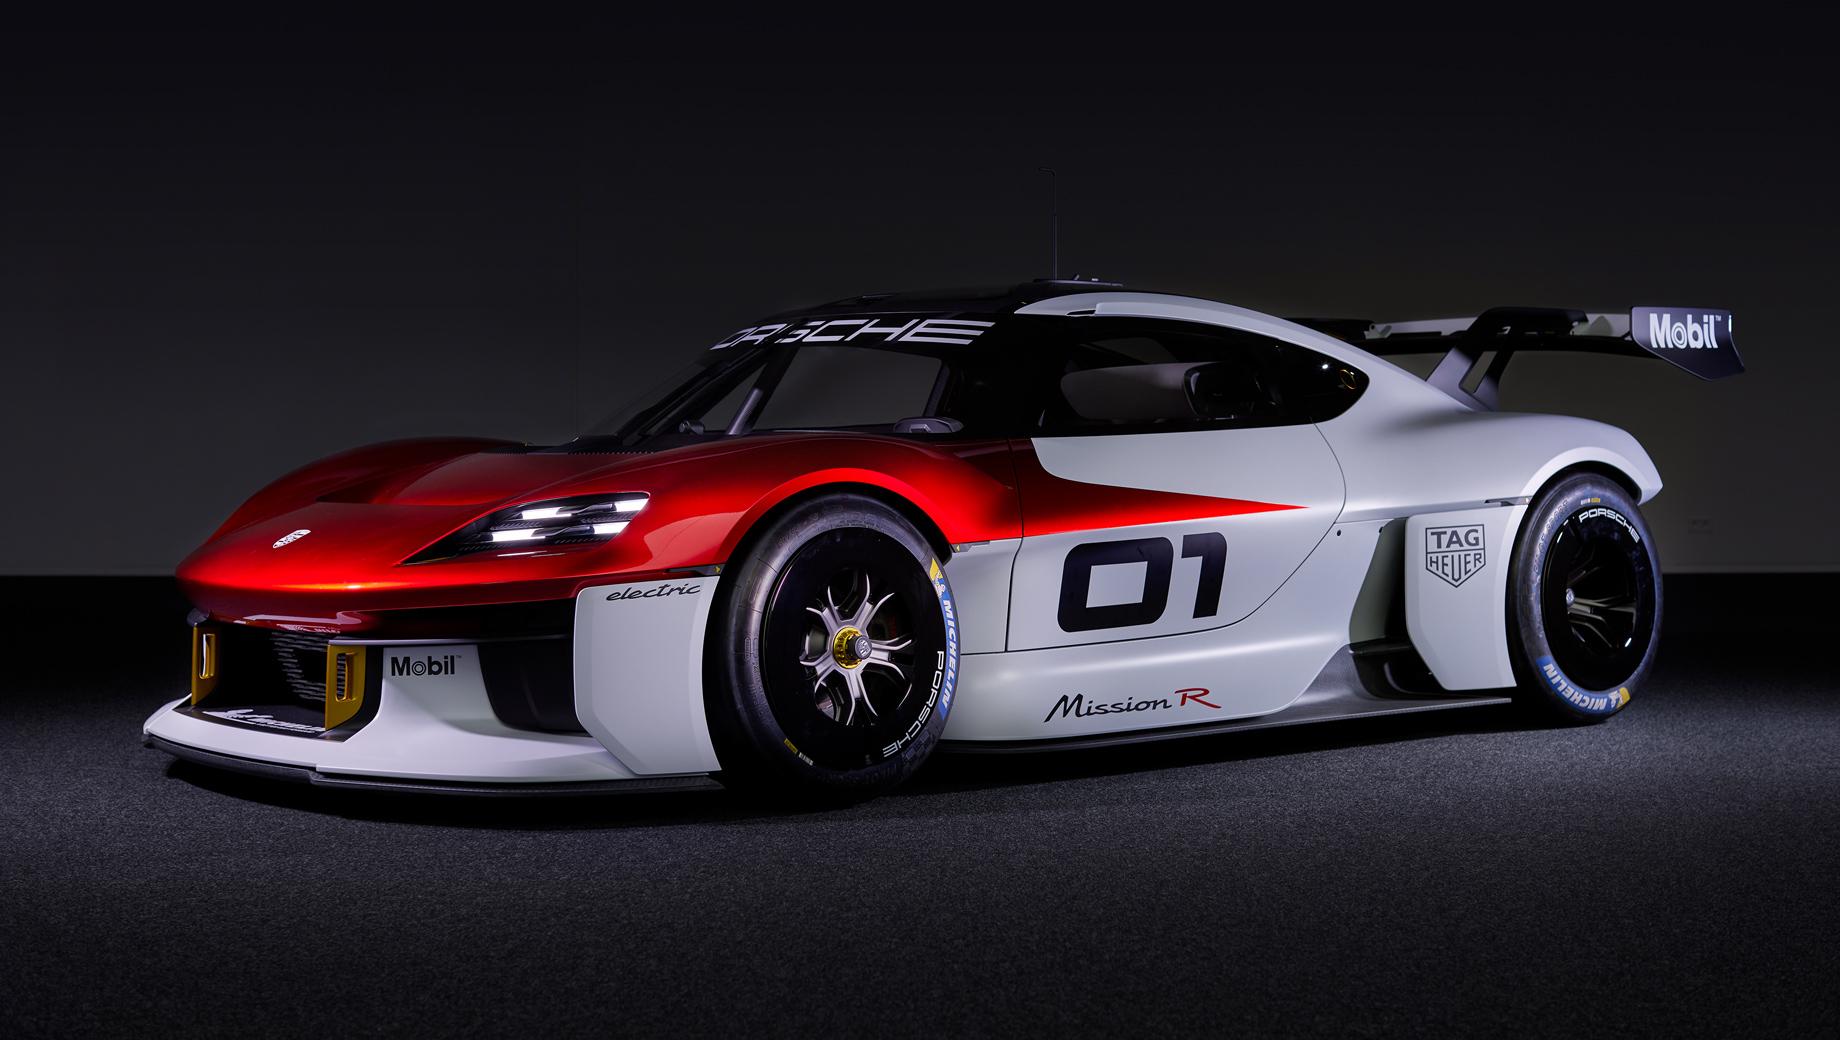 Porsche mission r,Porsche concept. По длине (4326 мм) Porsche Mission R чуть короче Каймана 718, но существенно шире и ниже (1990 и 1190 мм).